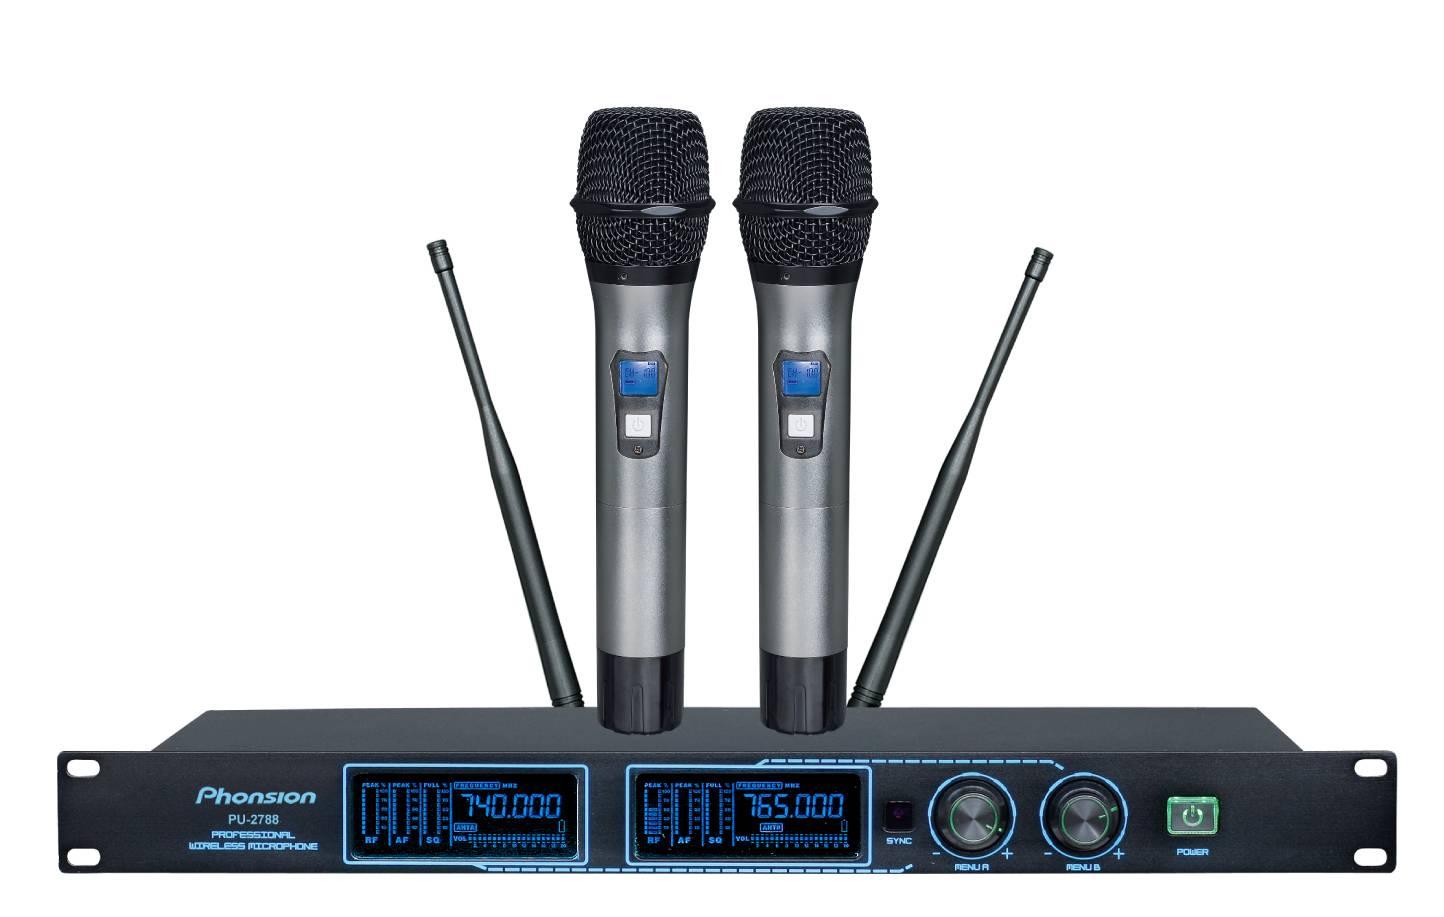 PU-2788 UHF Wireless Microphone